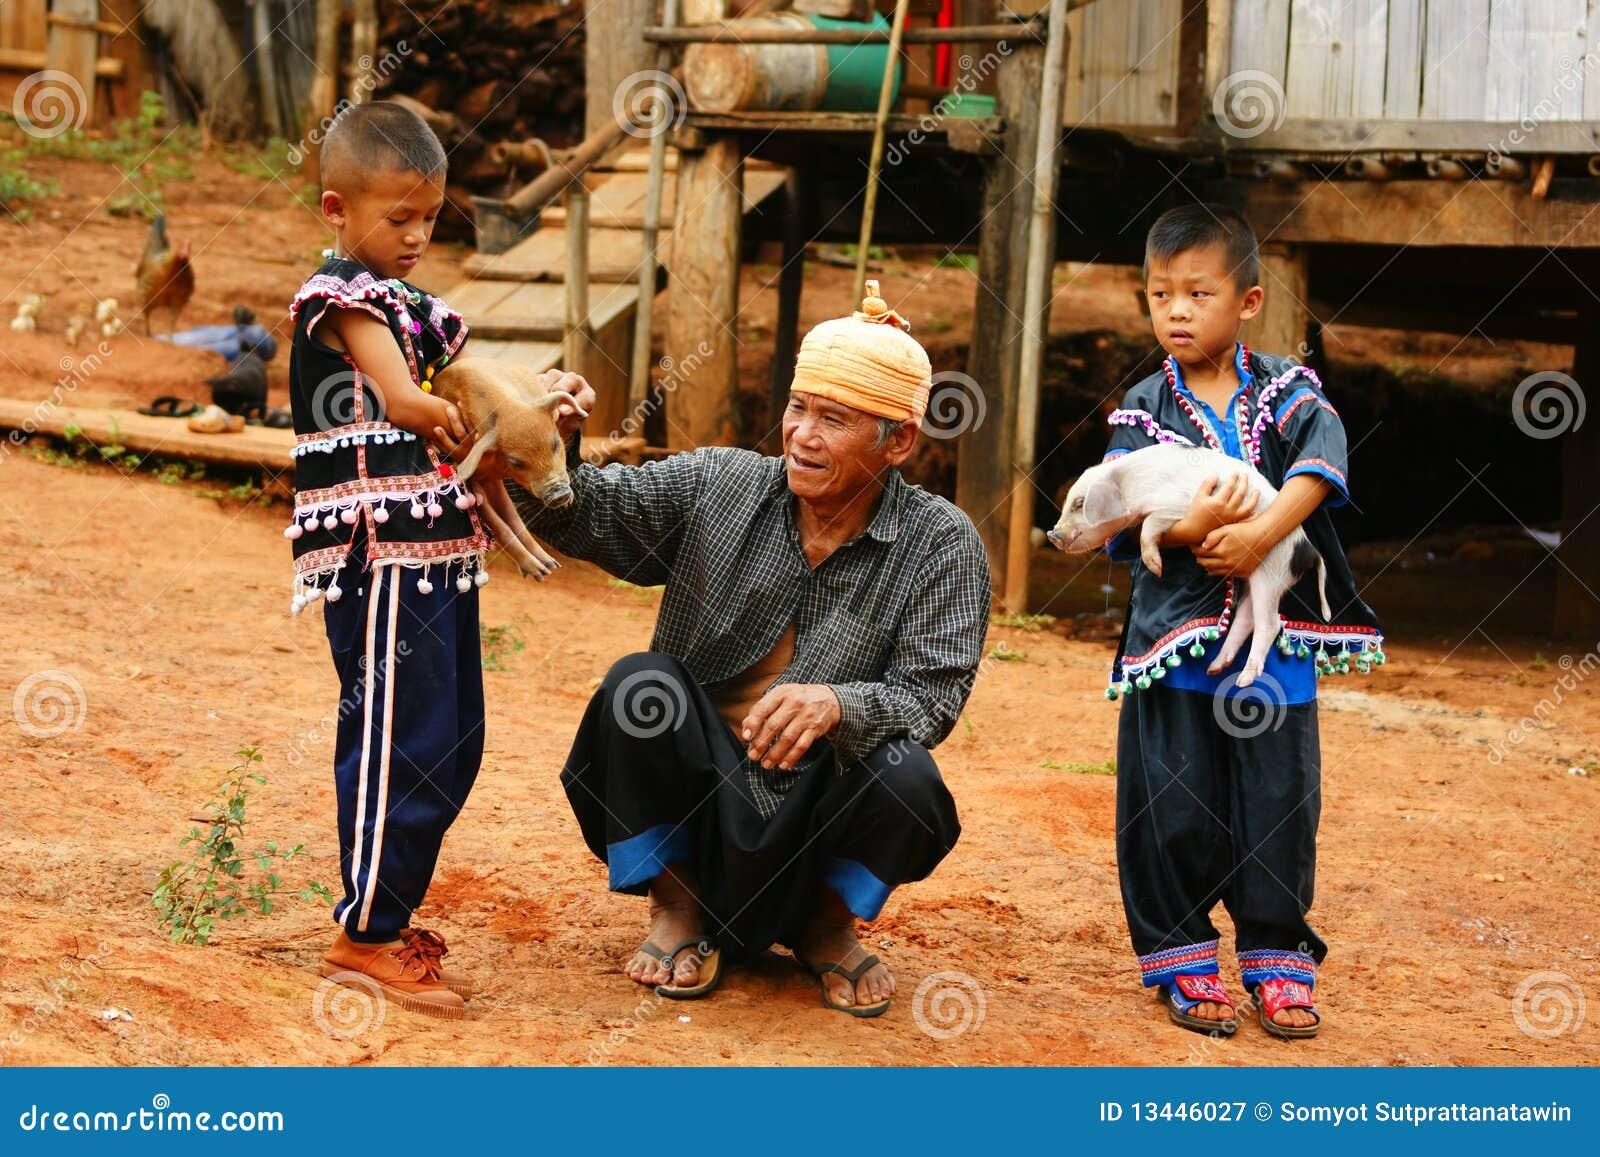 Lahu hill tribe